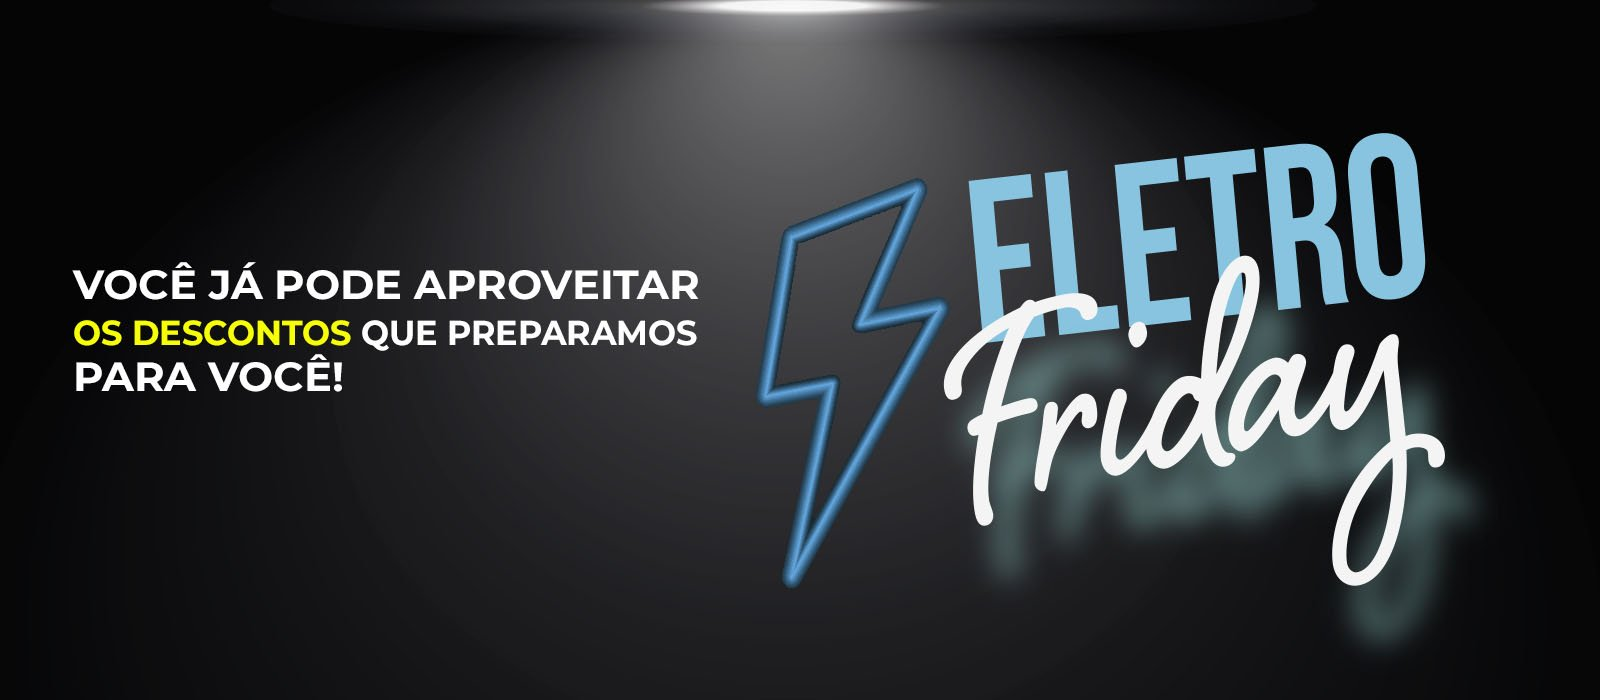 Eletrofriday